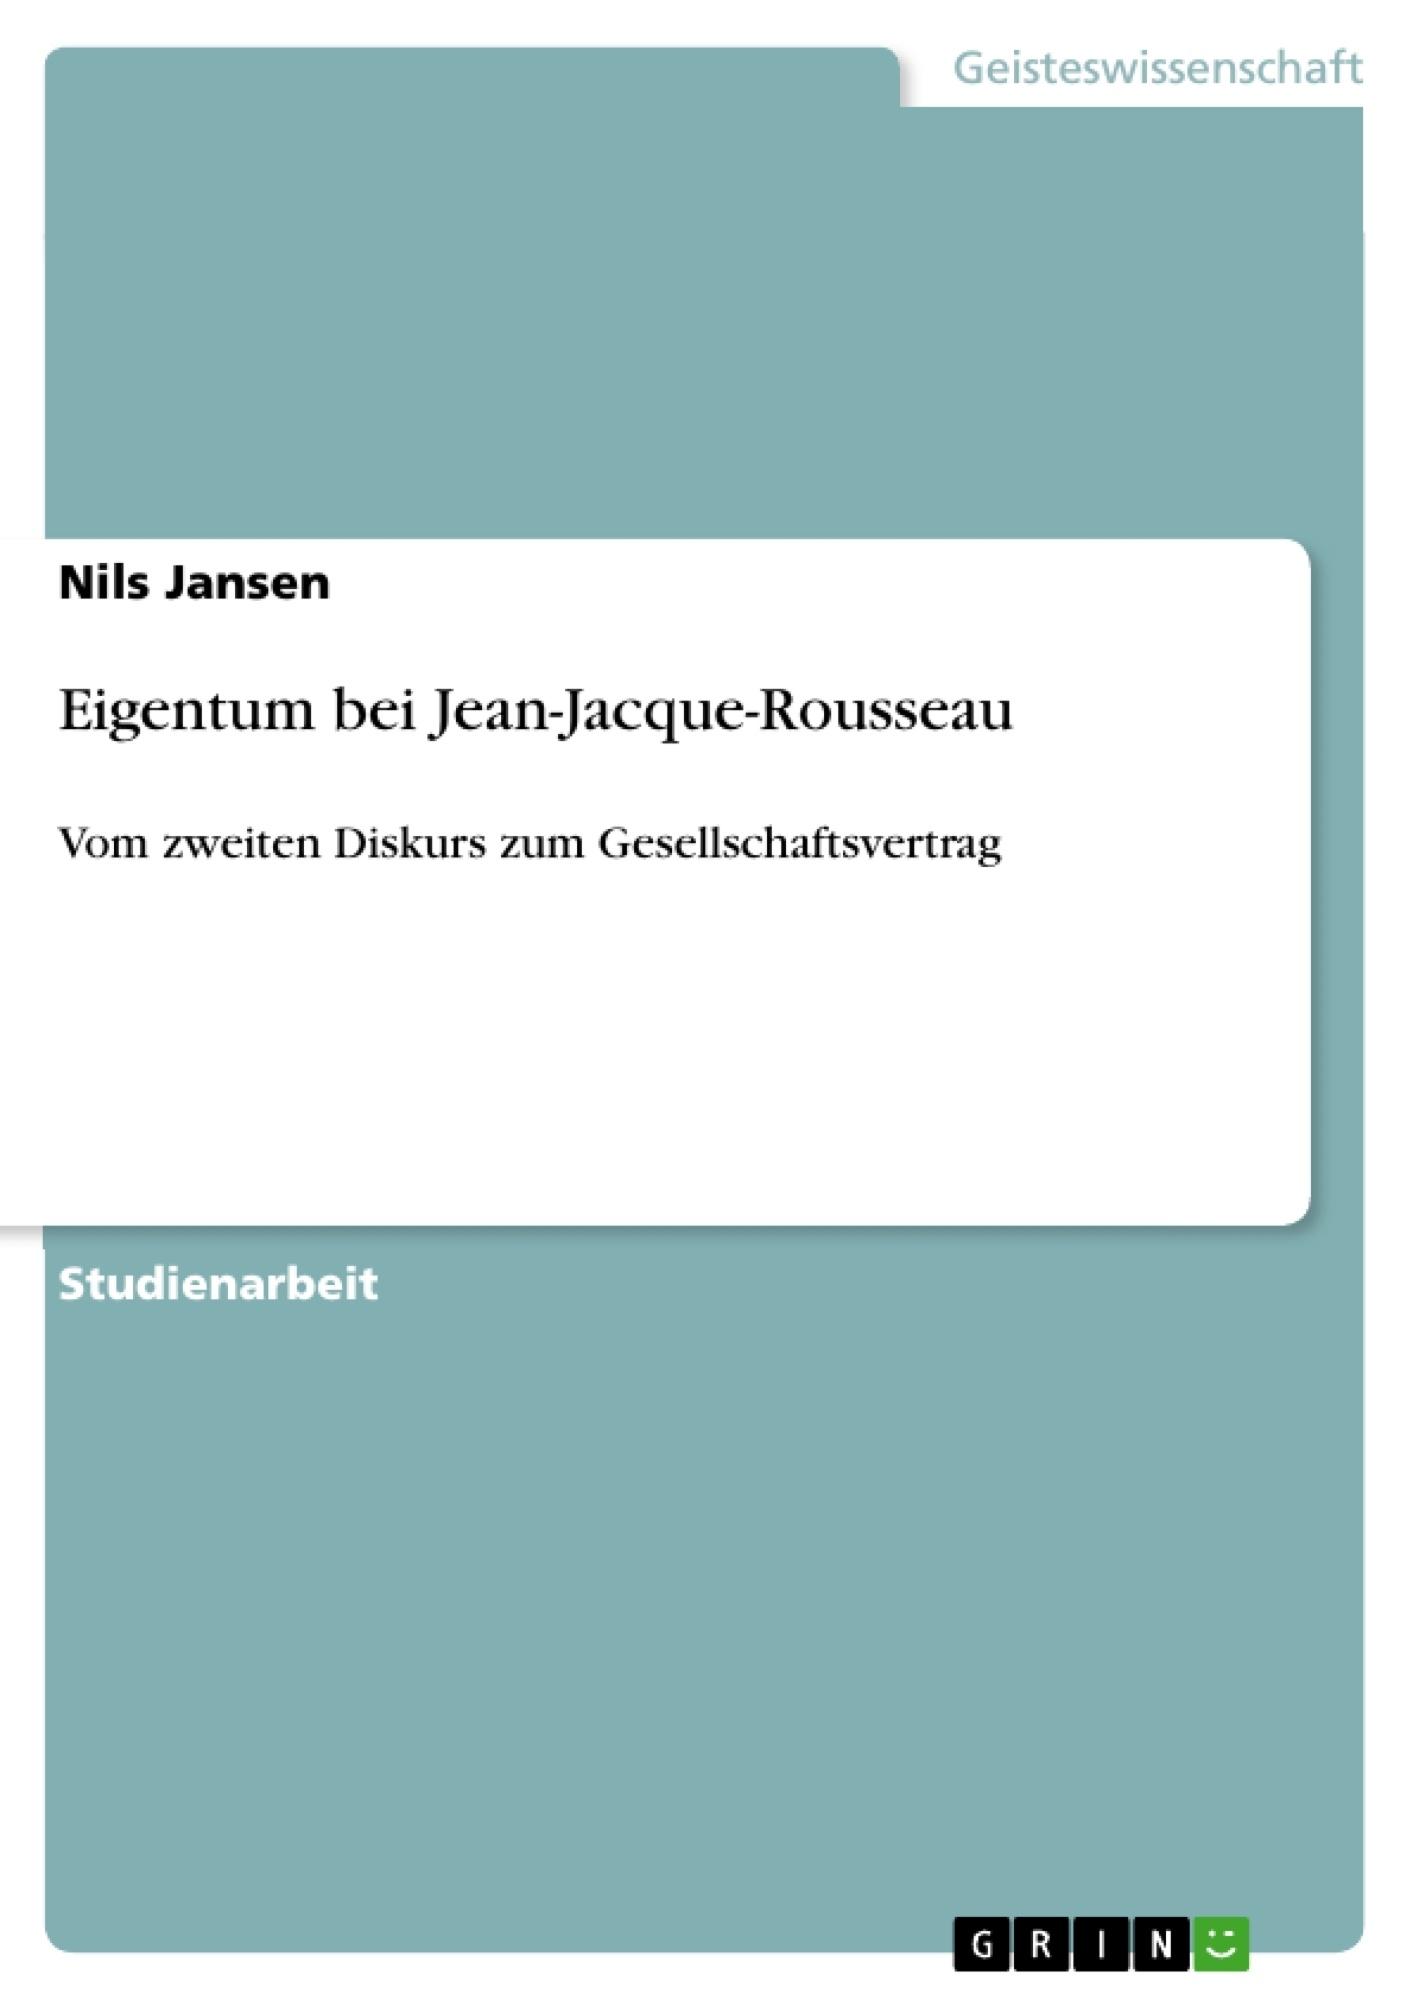 Titel: Eigentum bei Jean-Jacque-Rousseau